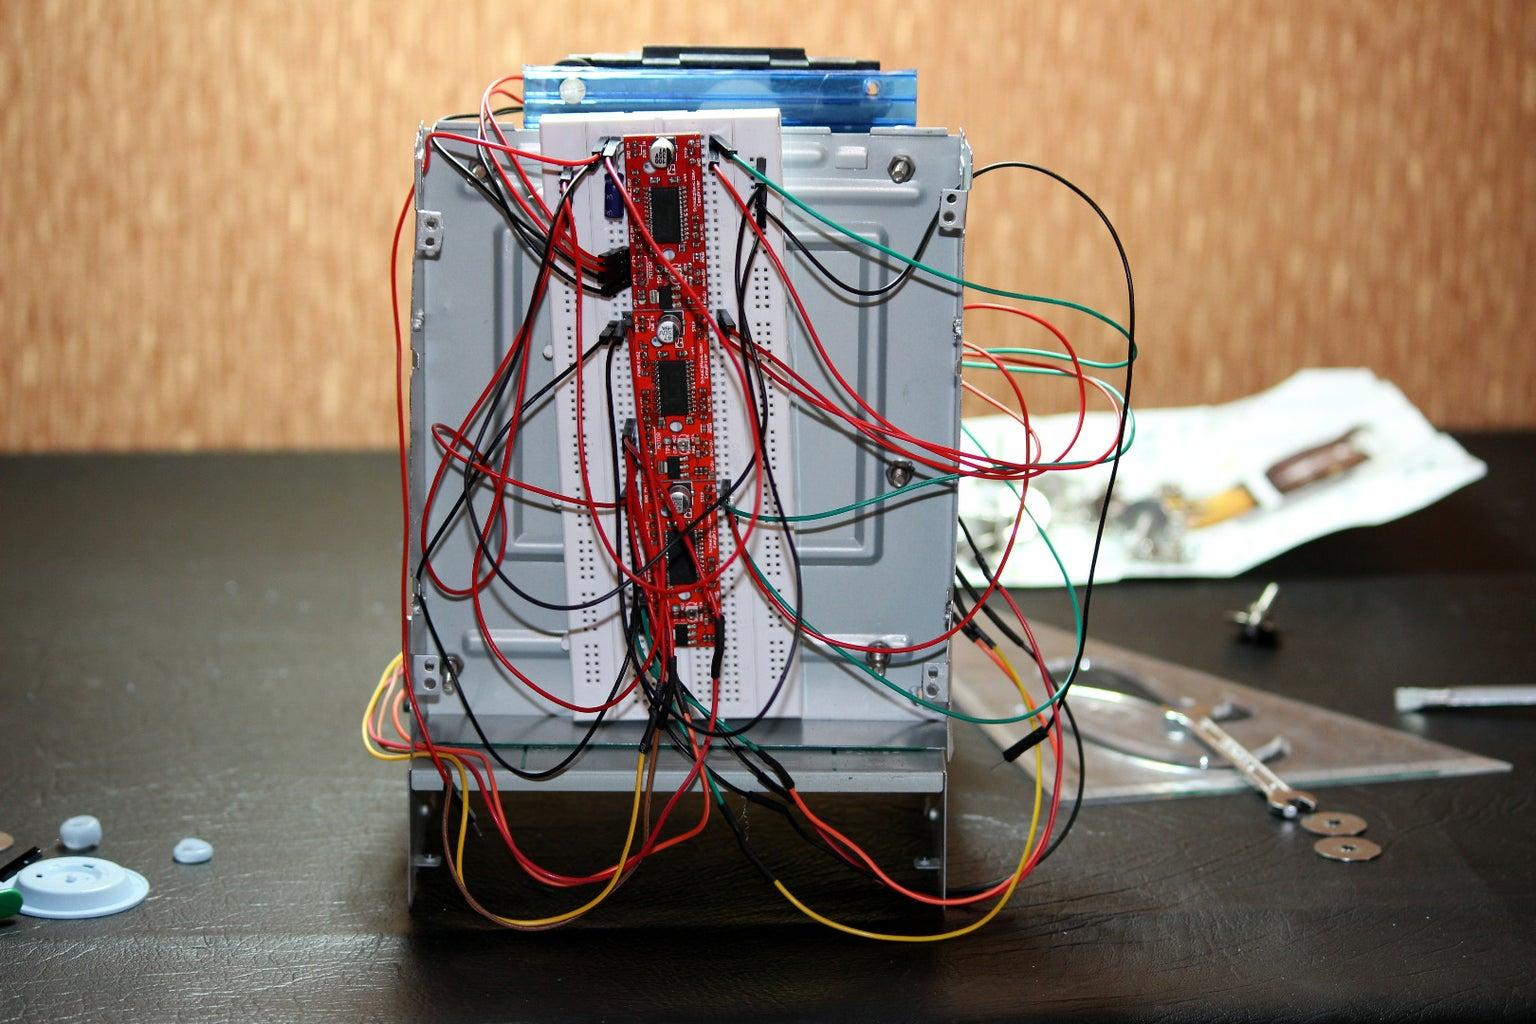 Make the Control Circuit